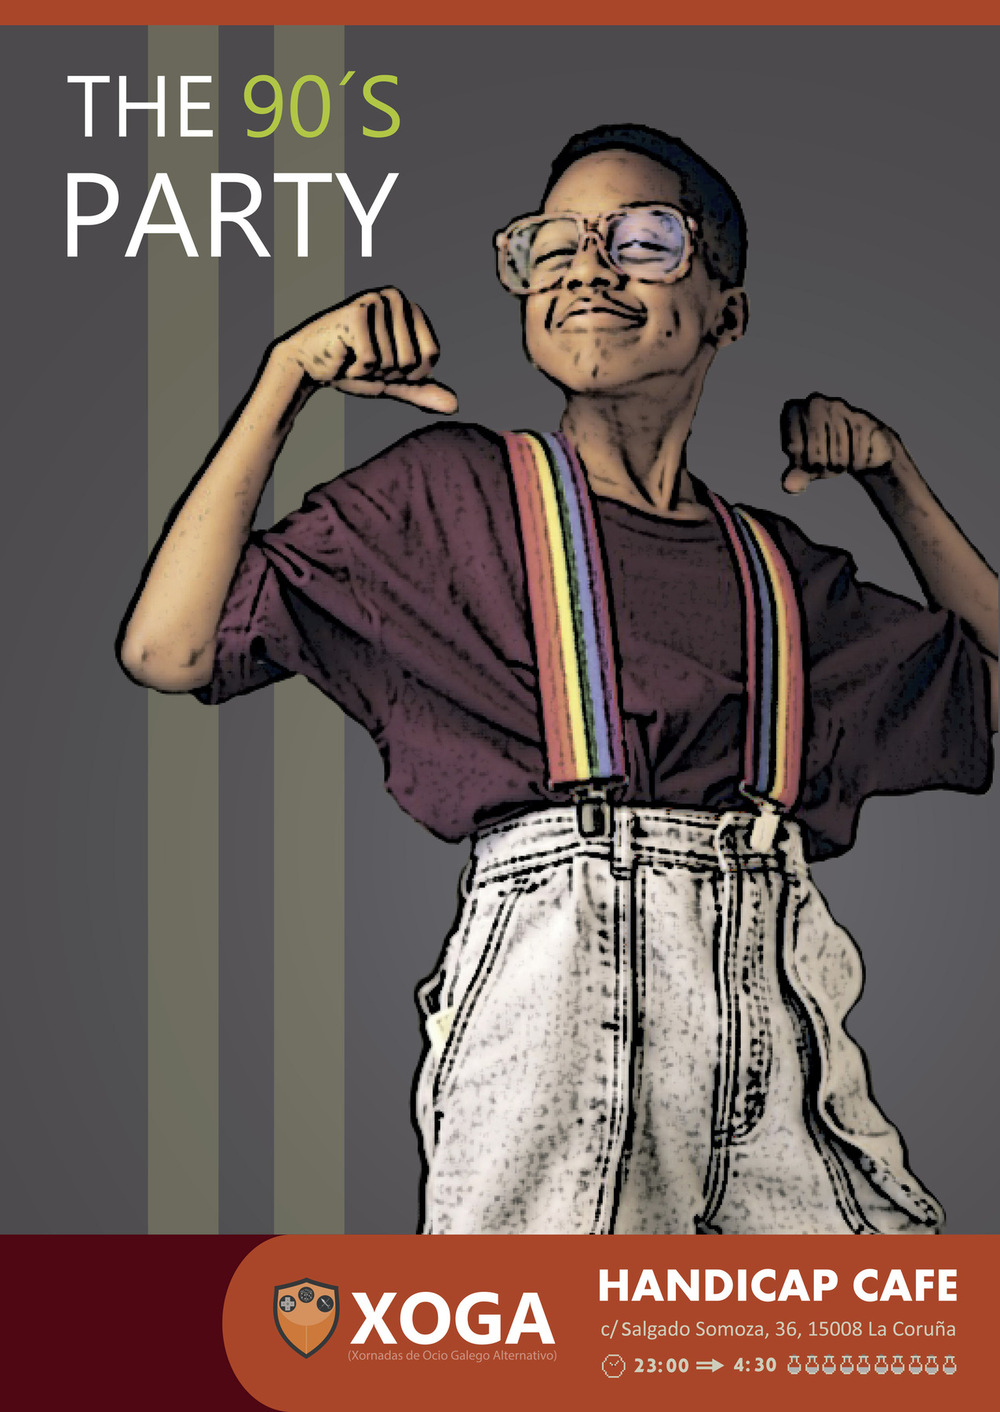 MausoLeiro - Cartel fiesta de los 90